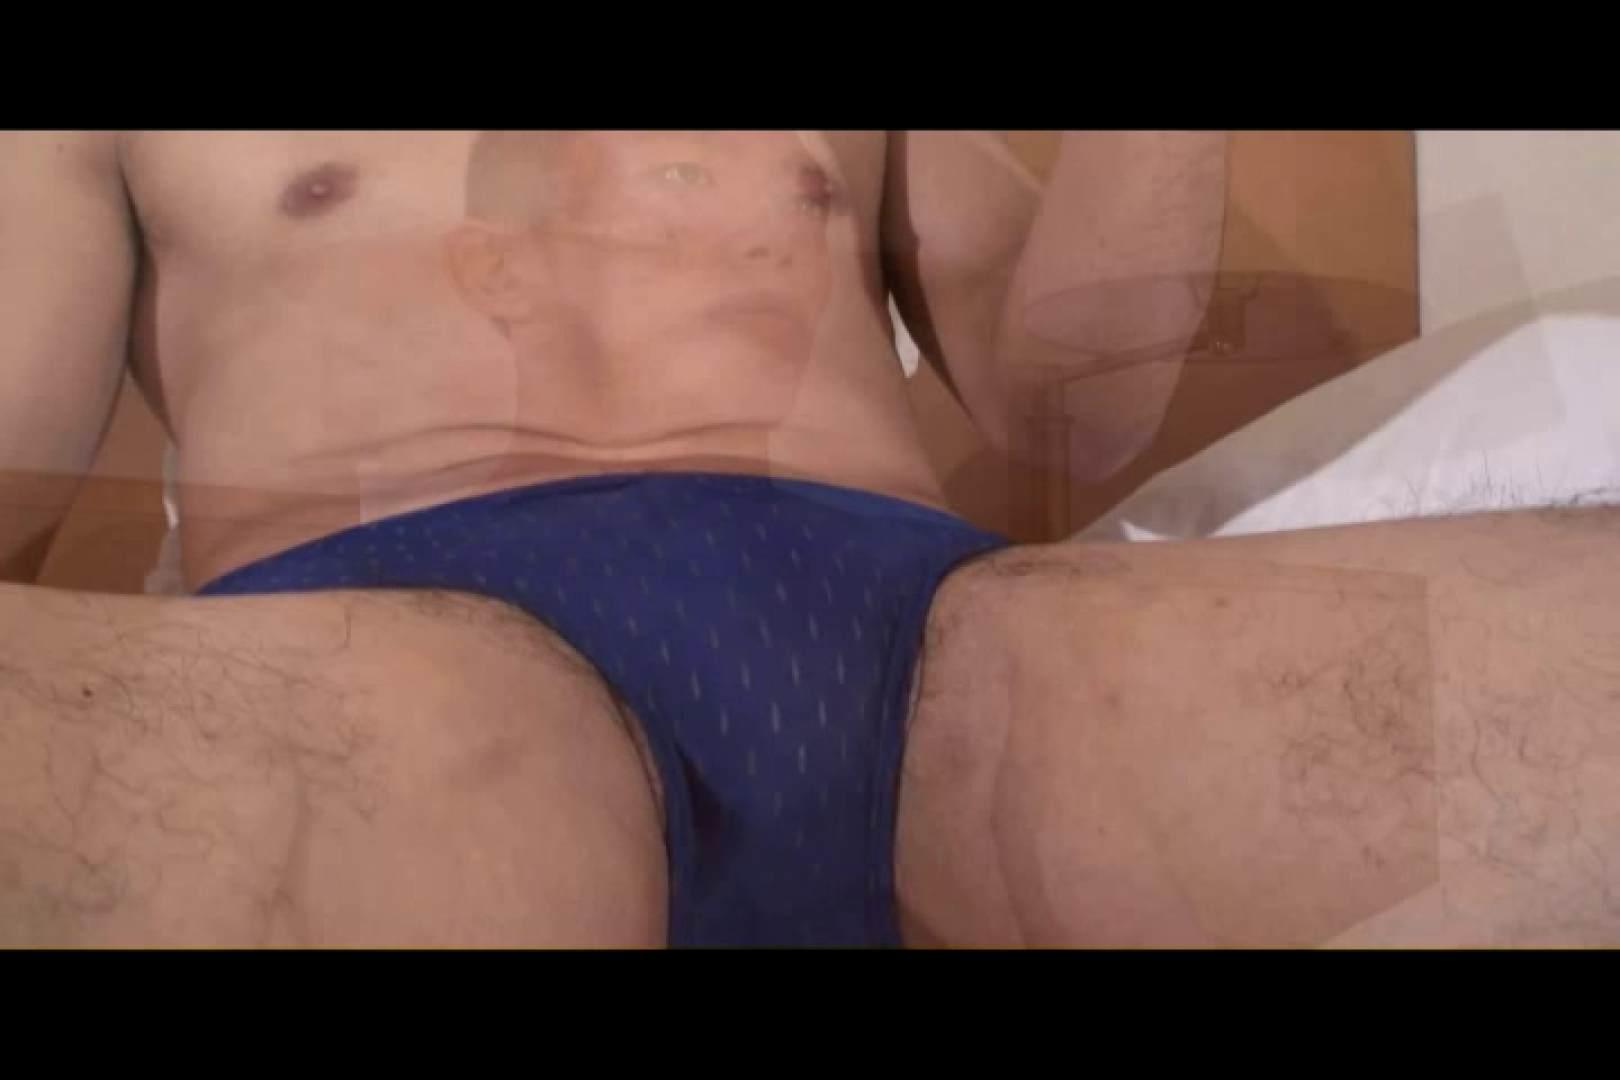 Bistro「イケメン」~Mokkori和風仕立て~vol.04 スポーツマン ゲイヌード画像 91枚 24